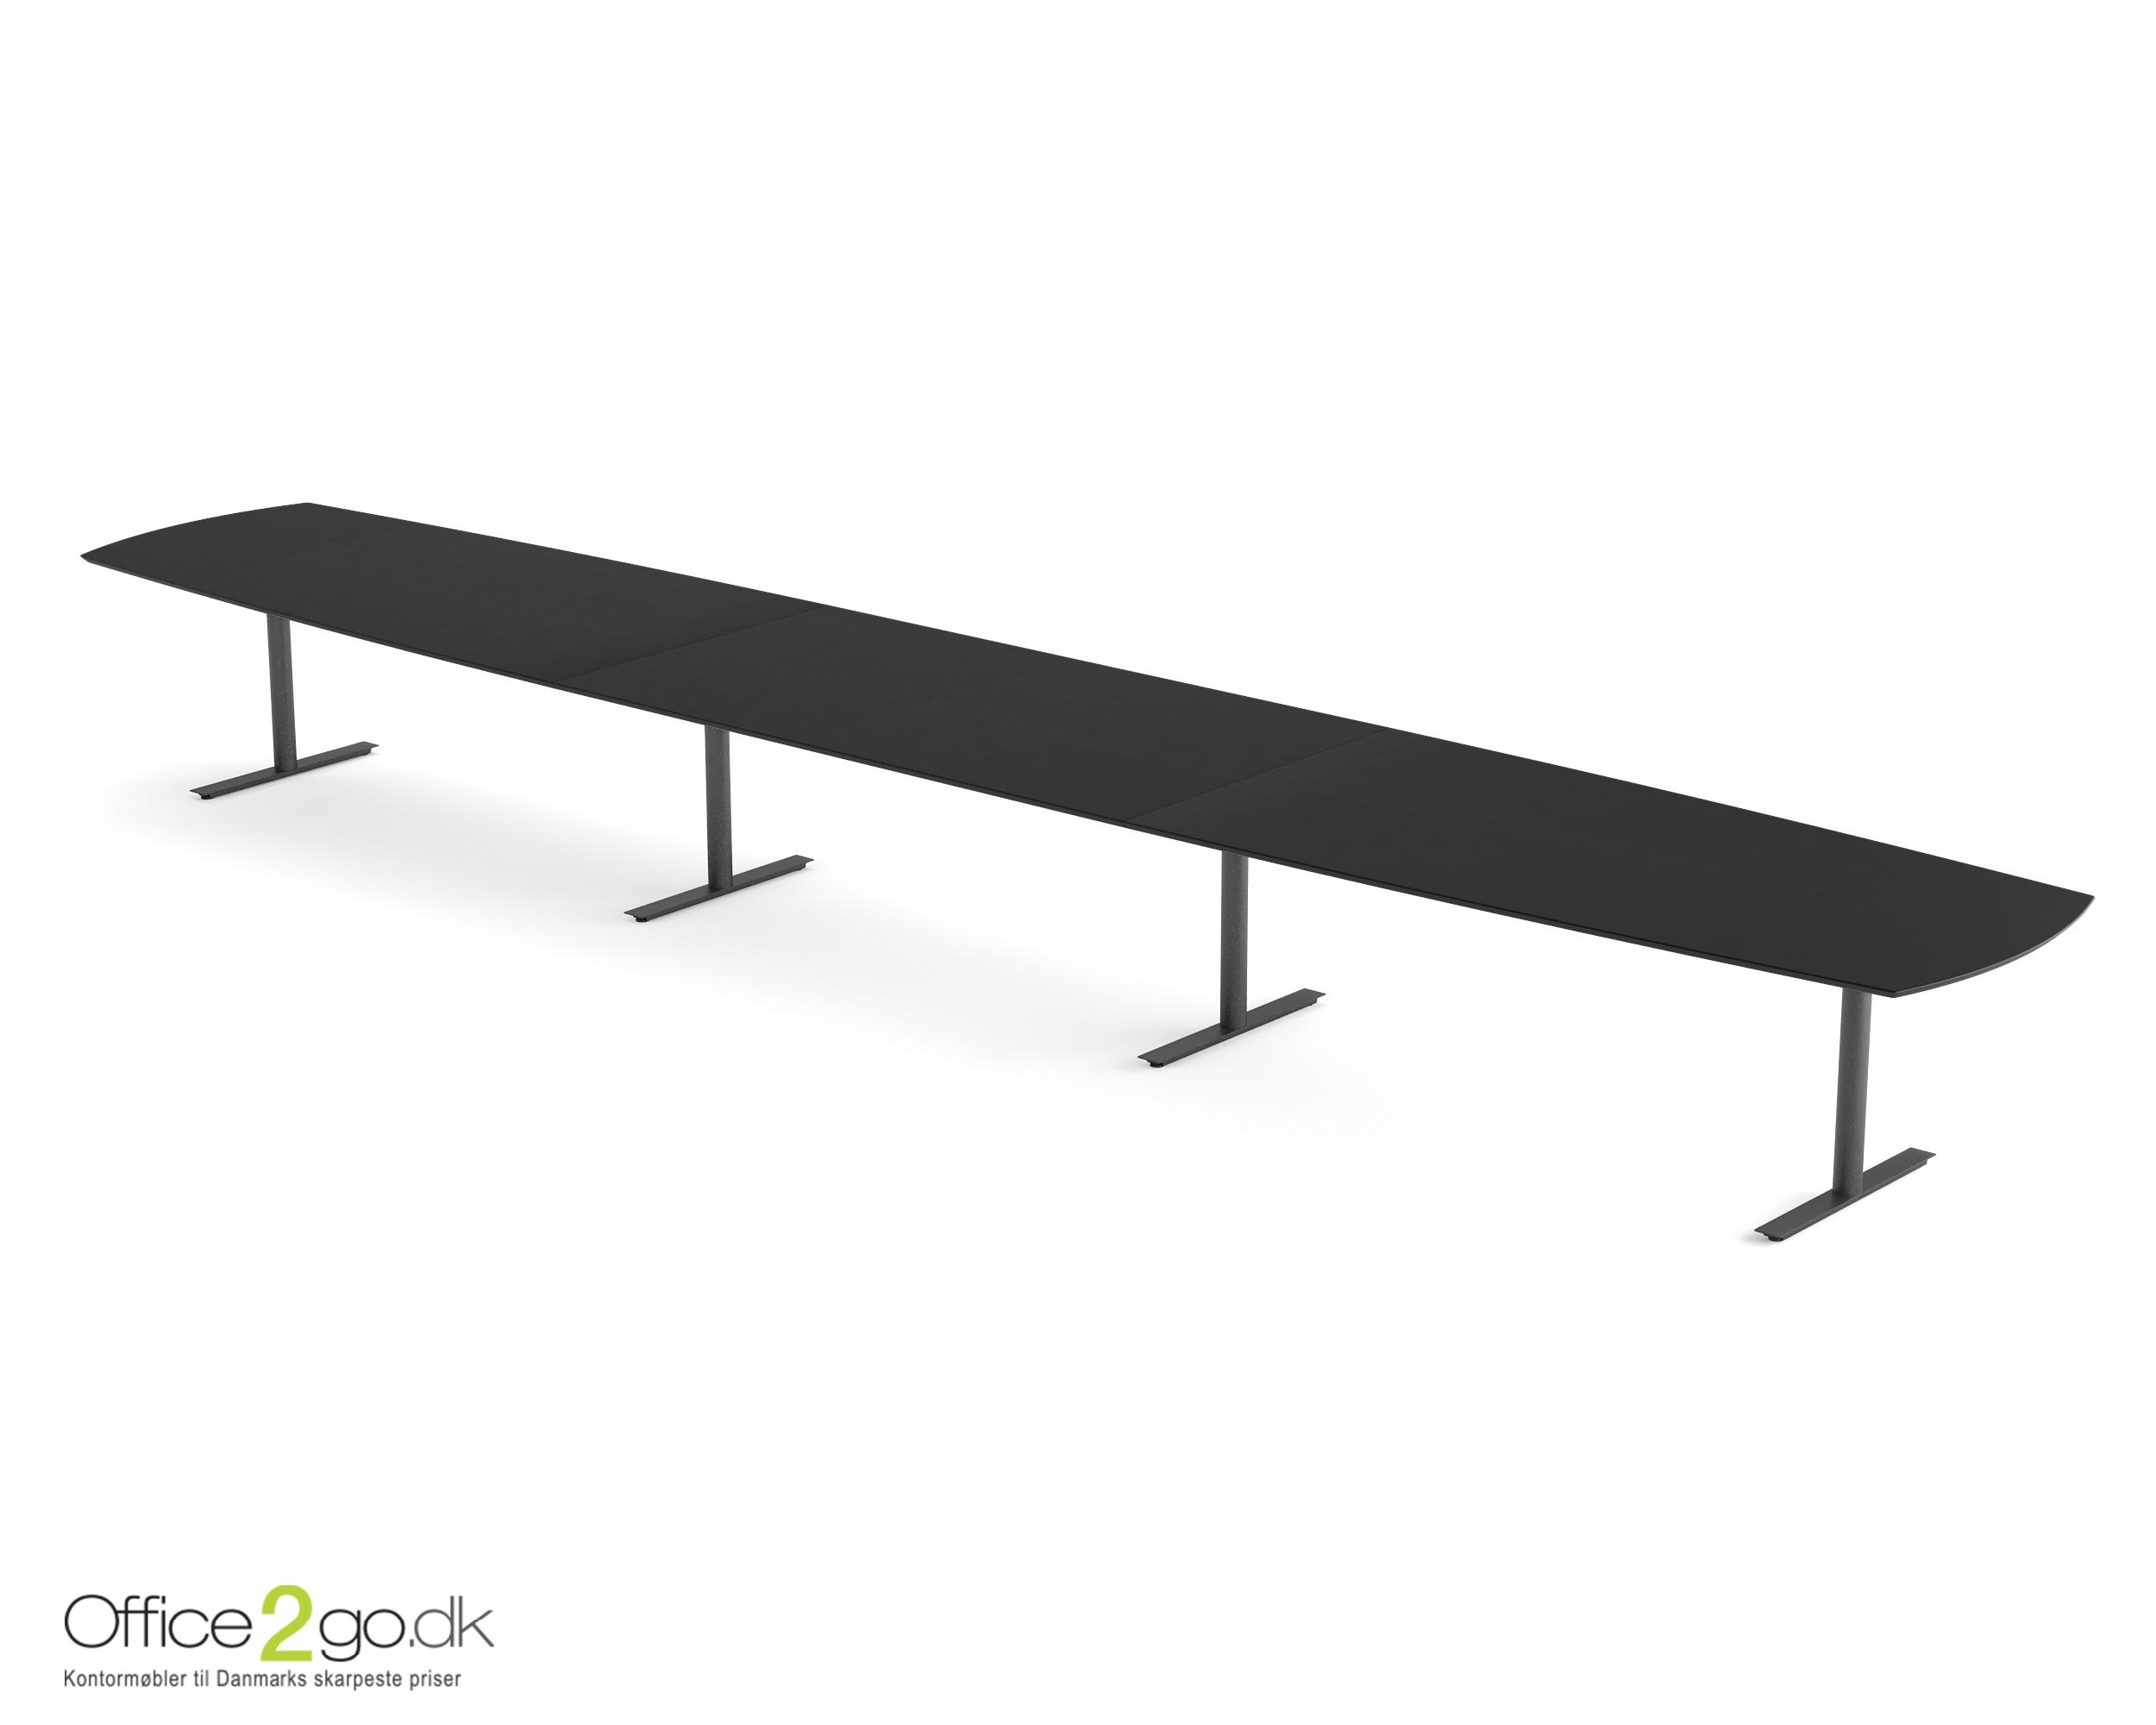 InLine mødebord - 20-22 personer - 640 cm.